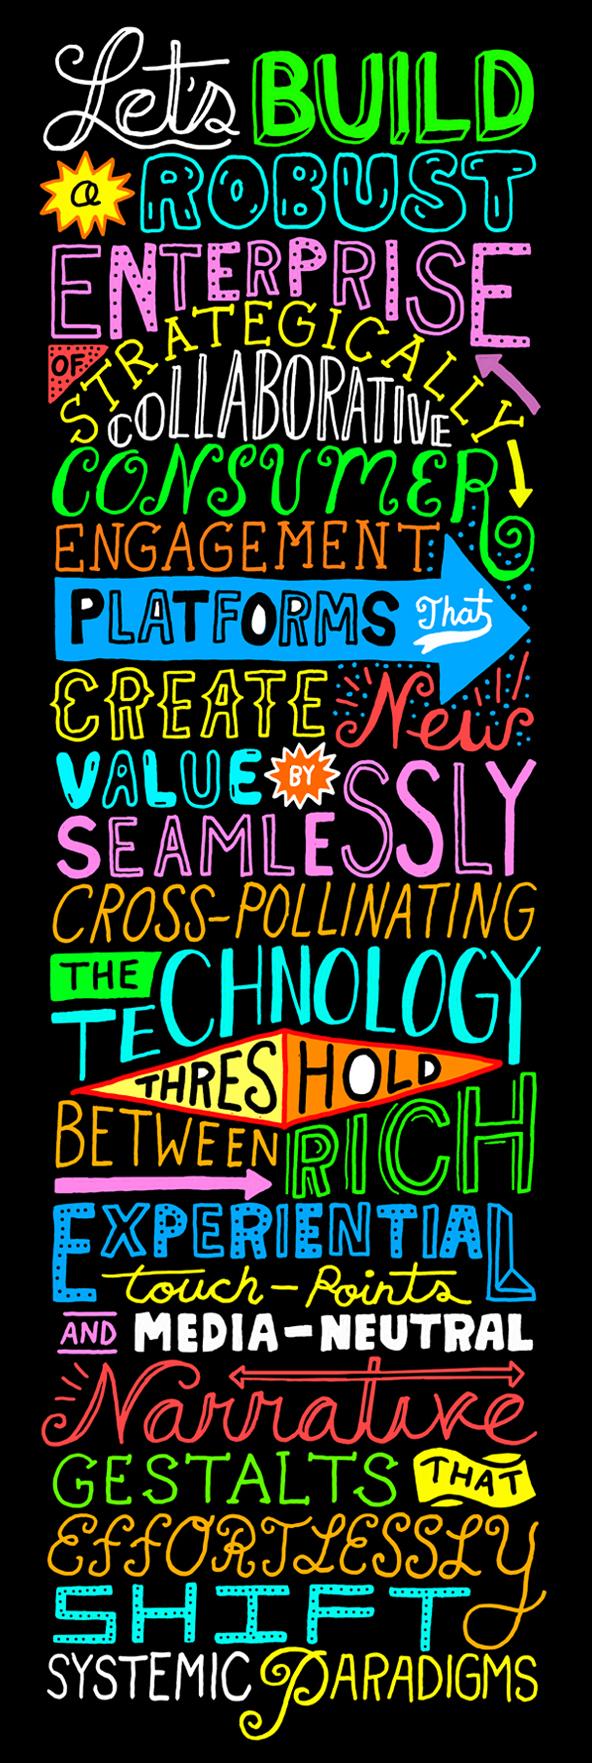 Thumbnail for My Tech Start-Up Idea